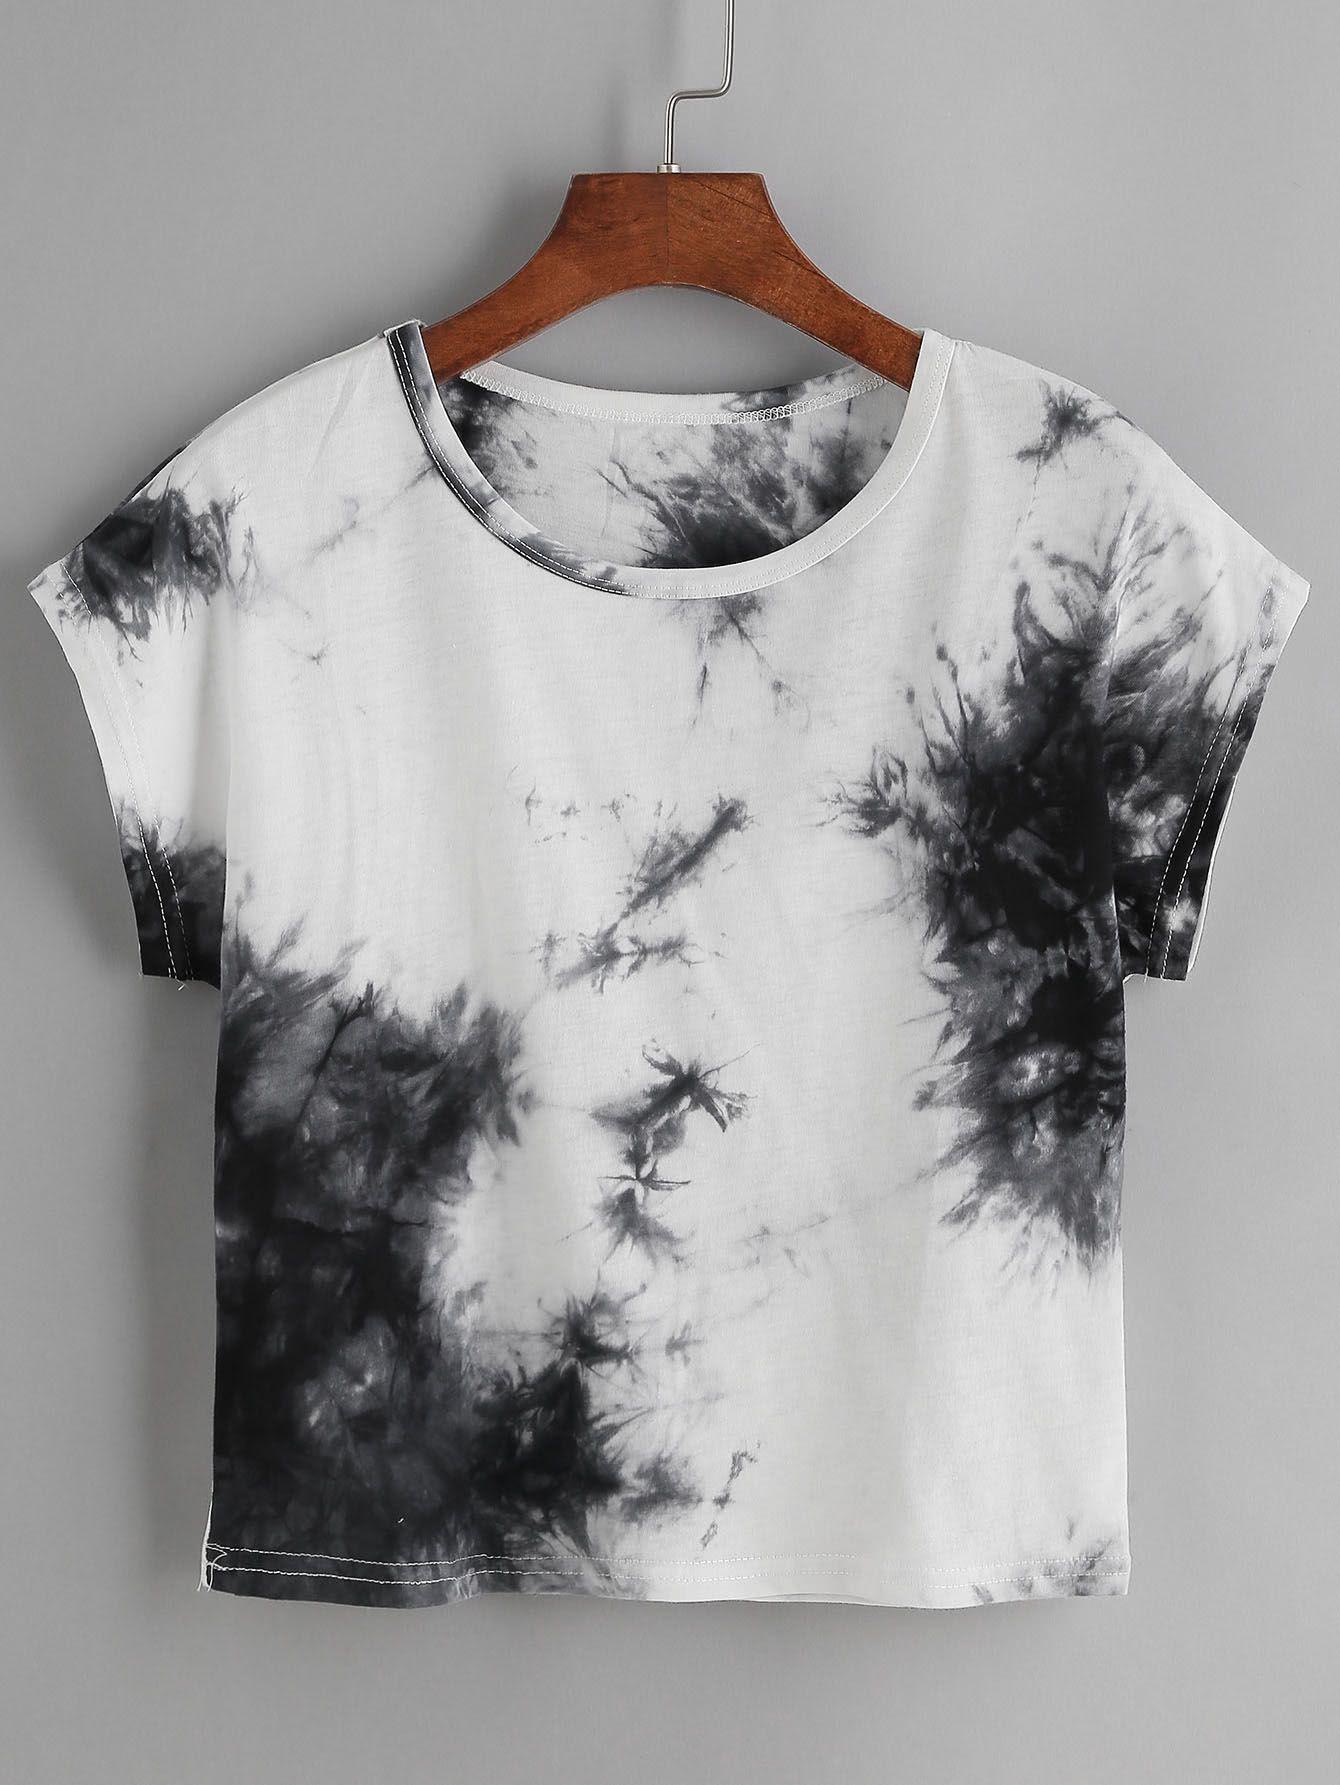 Tie Dye Shirt Ideas Tumblr Bcd Tofu House